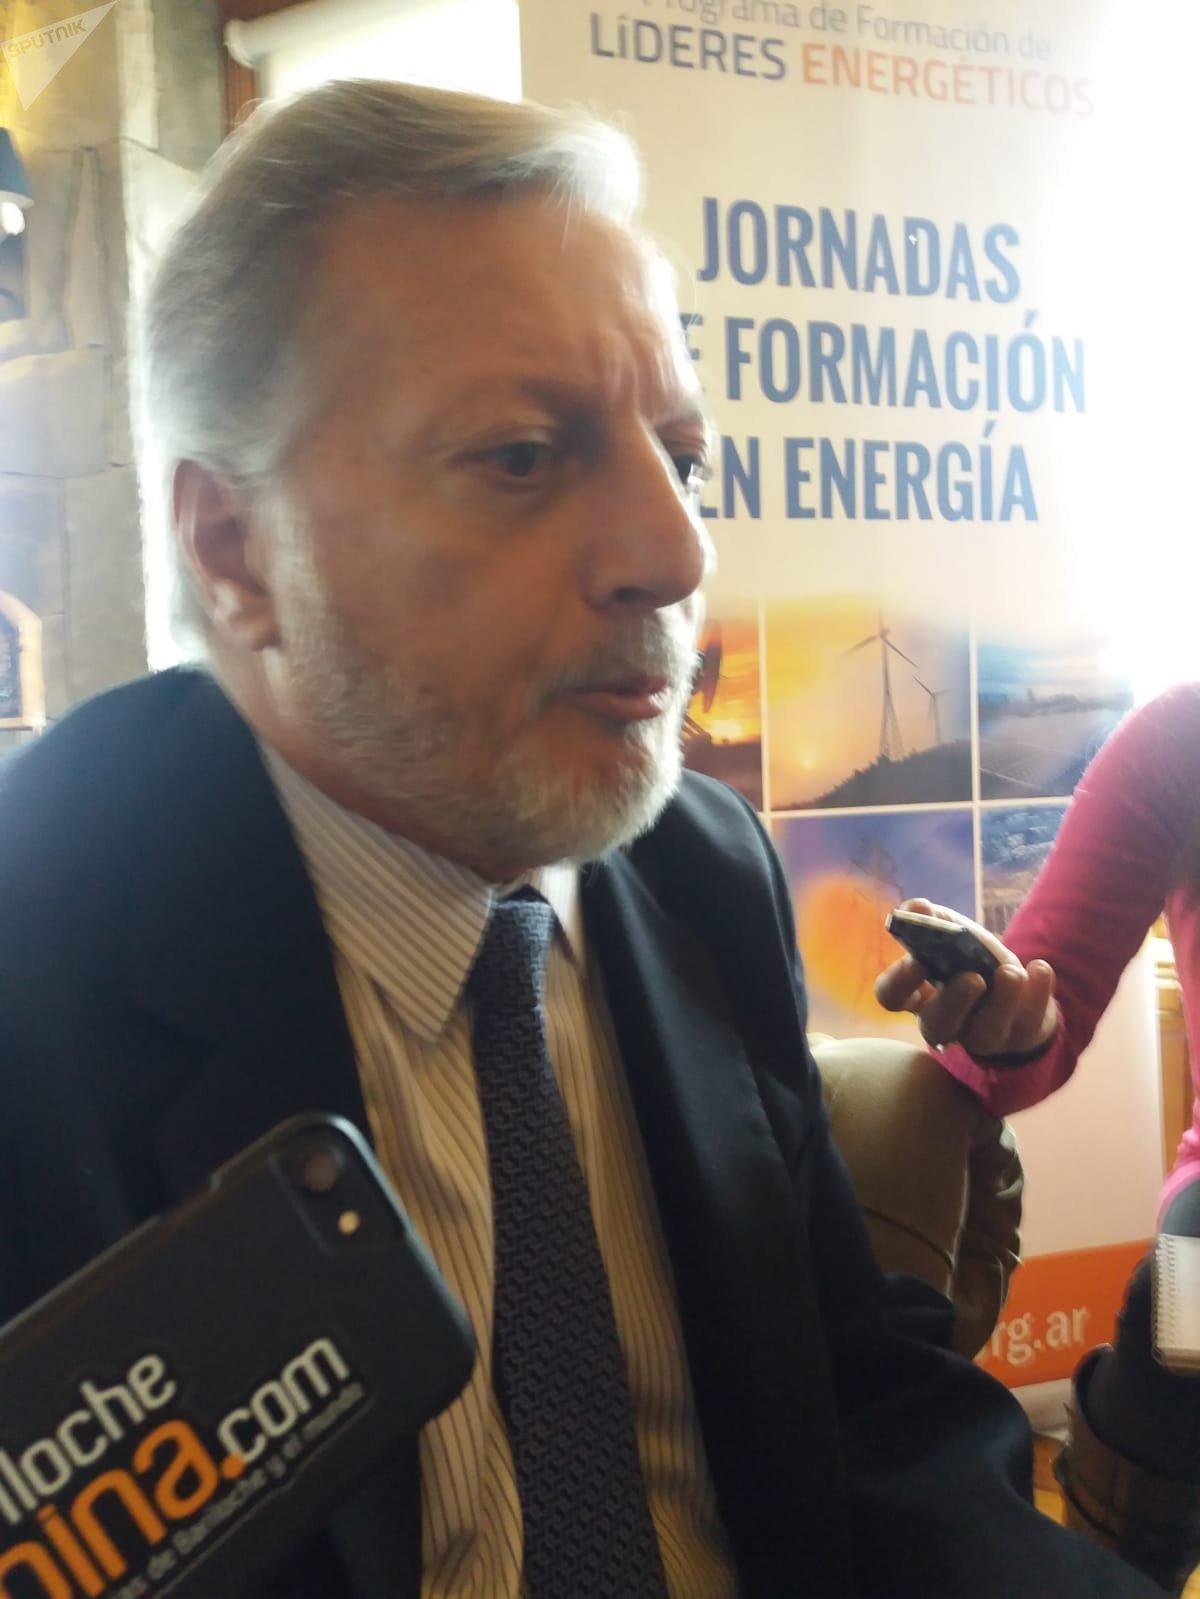 Ministro de Energía de Argentina, Juan José Aranguren